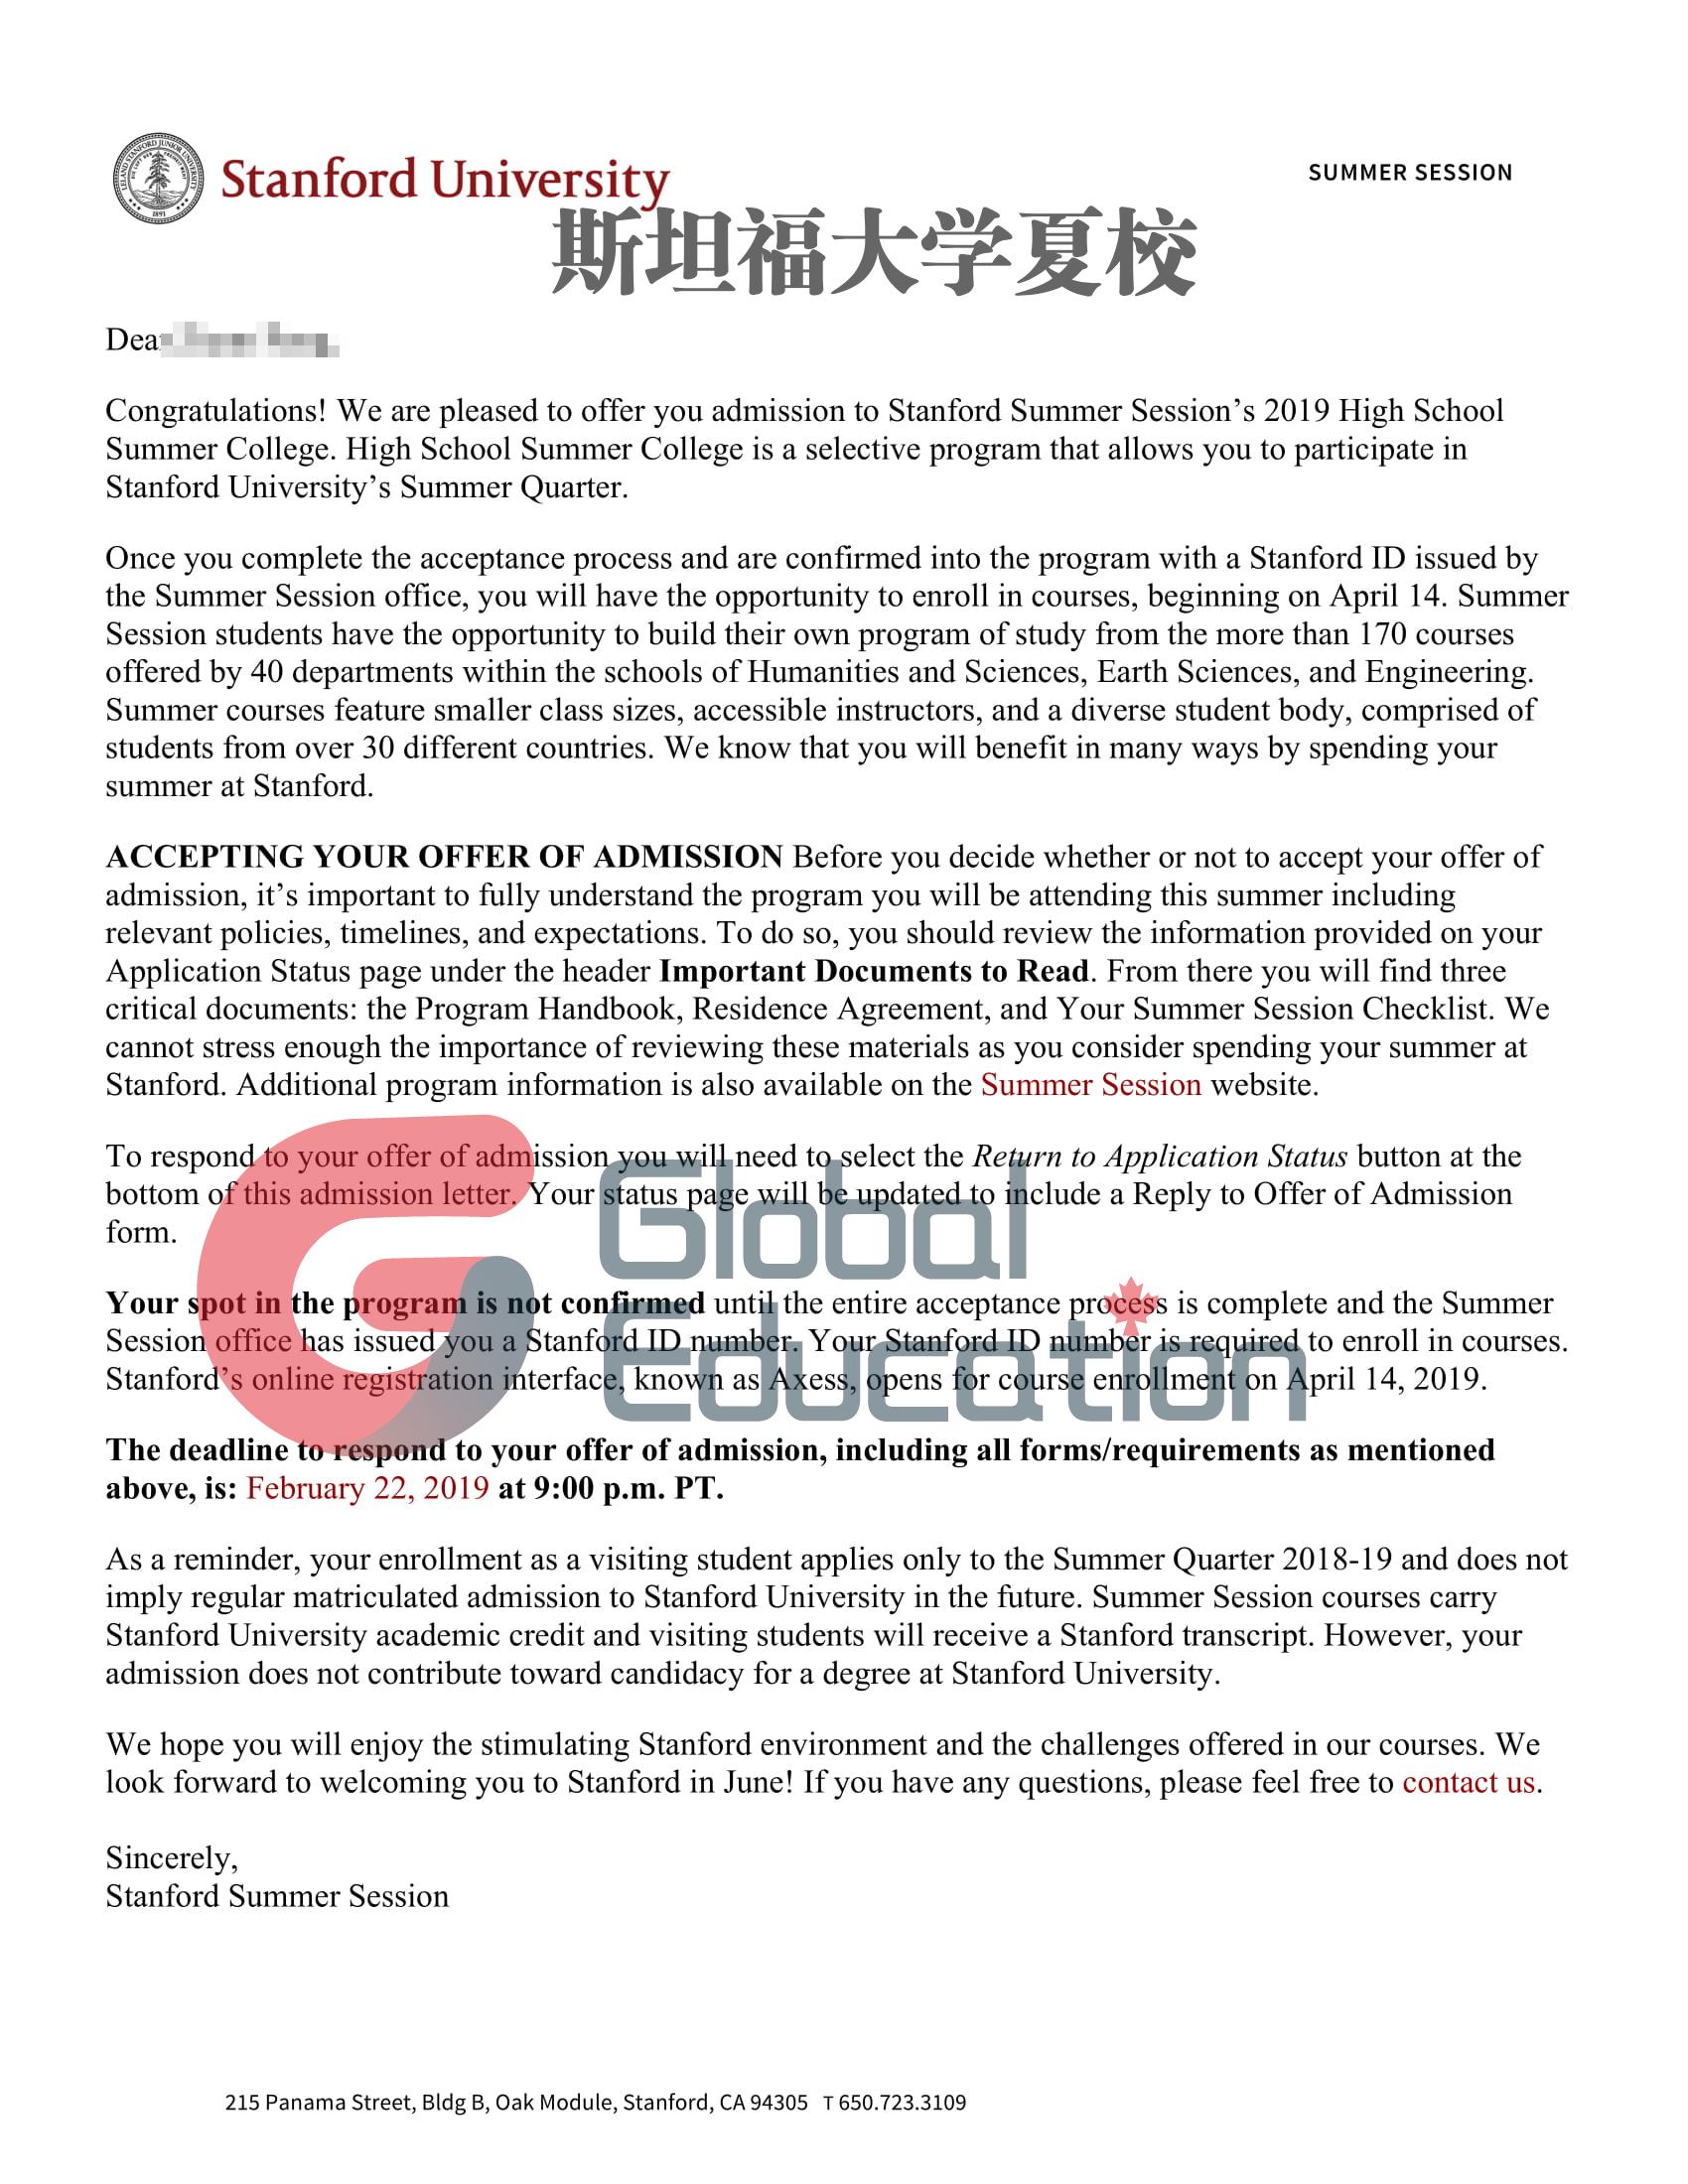 Stanford Letter-1